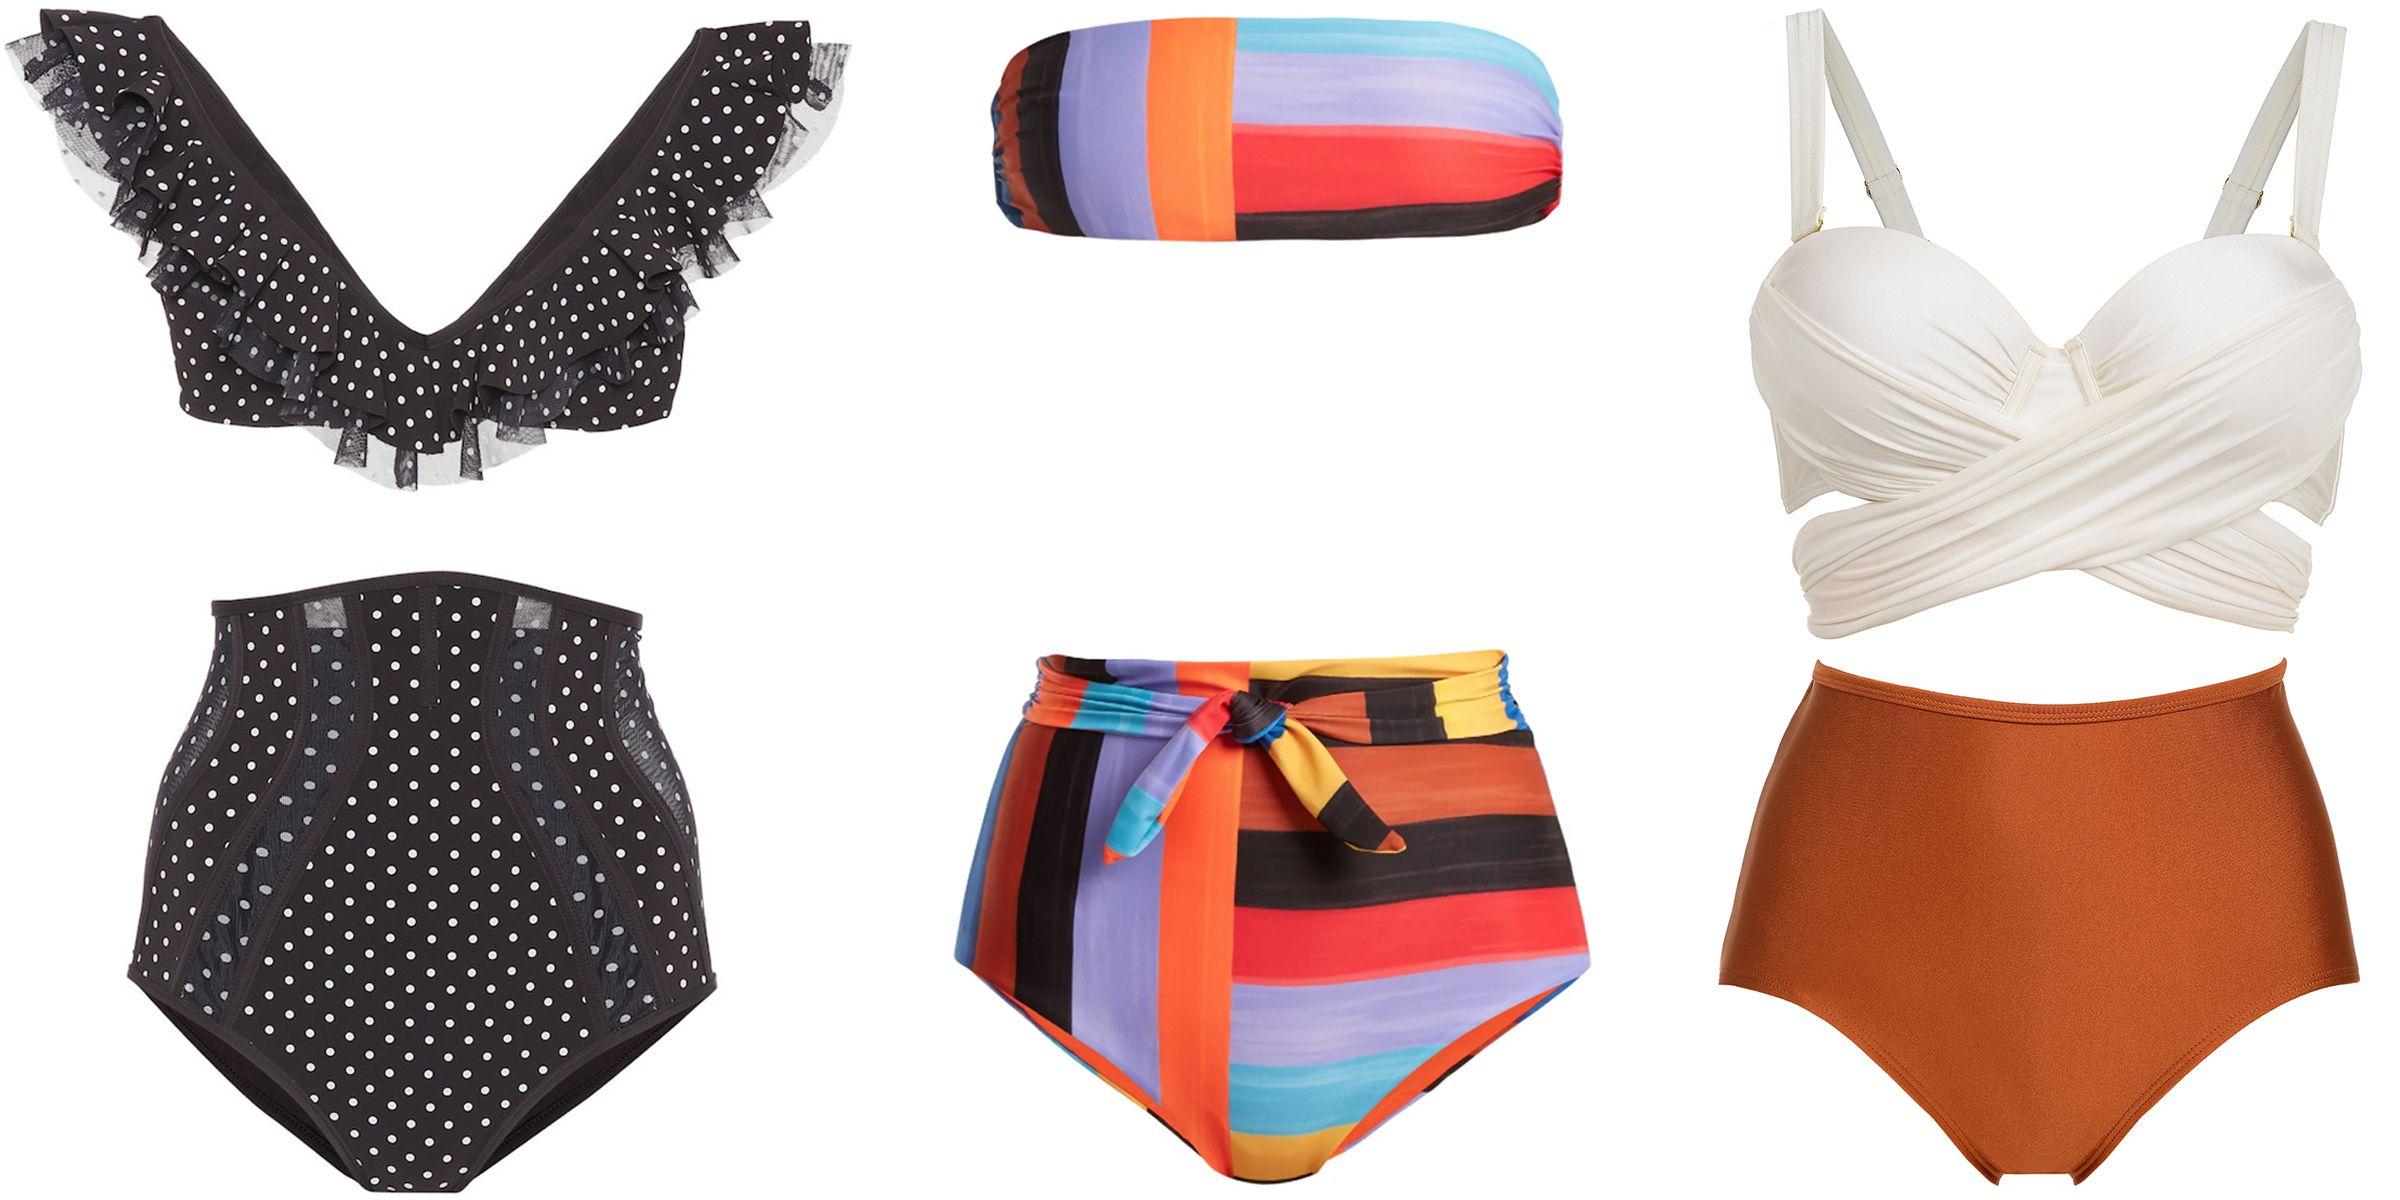 The Sexiest High-Waisted Bikinis For Your Next Beach Getaway